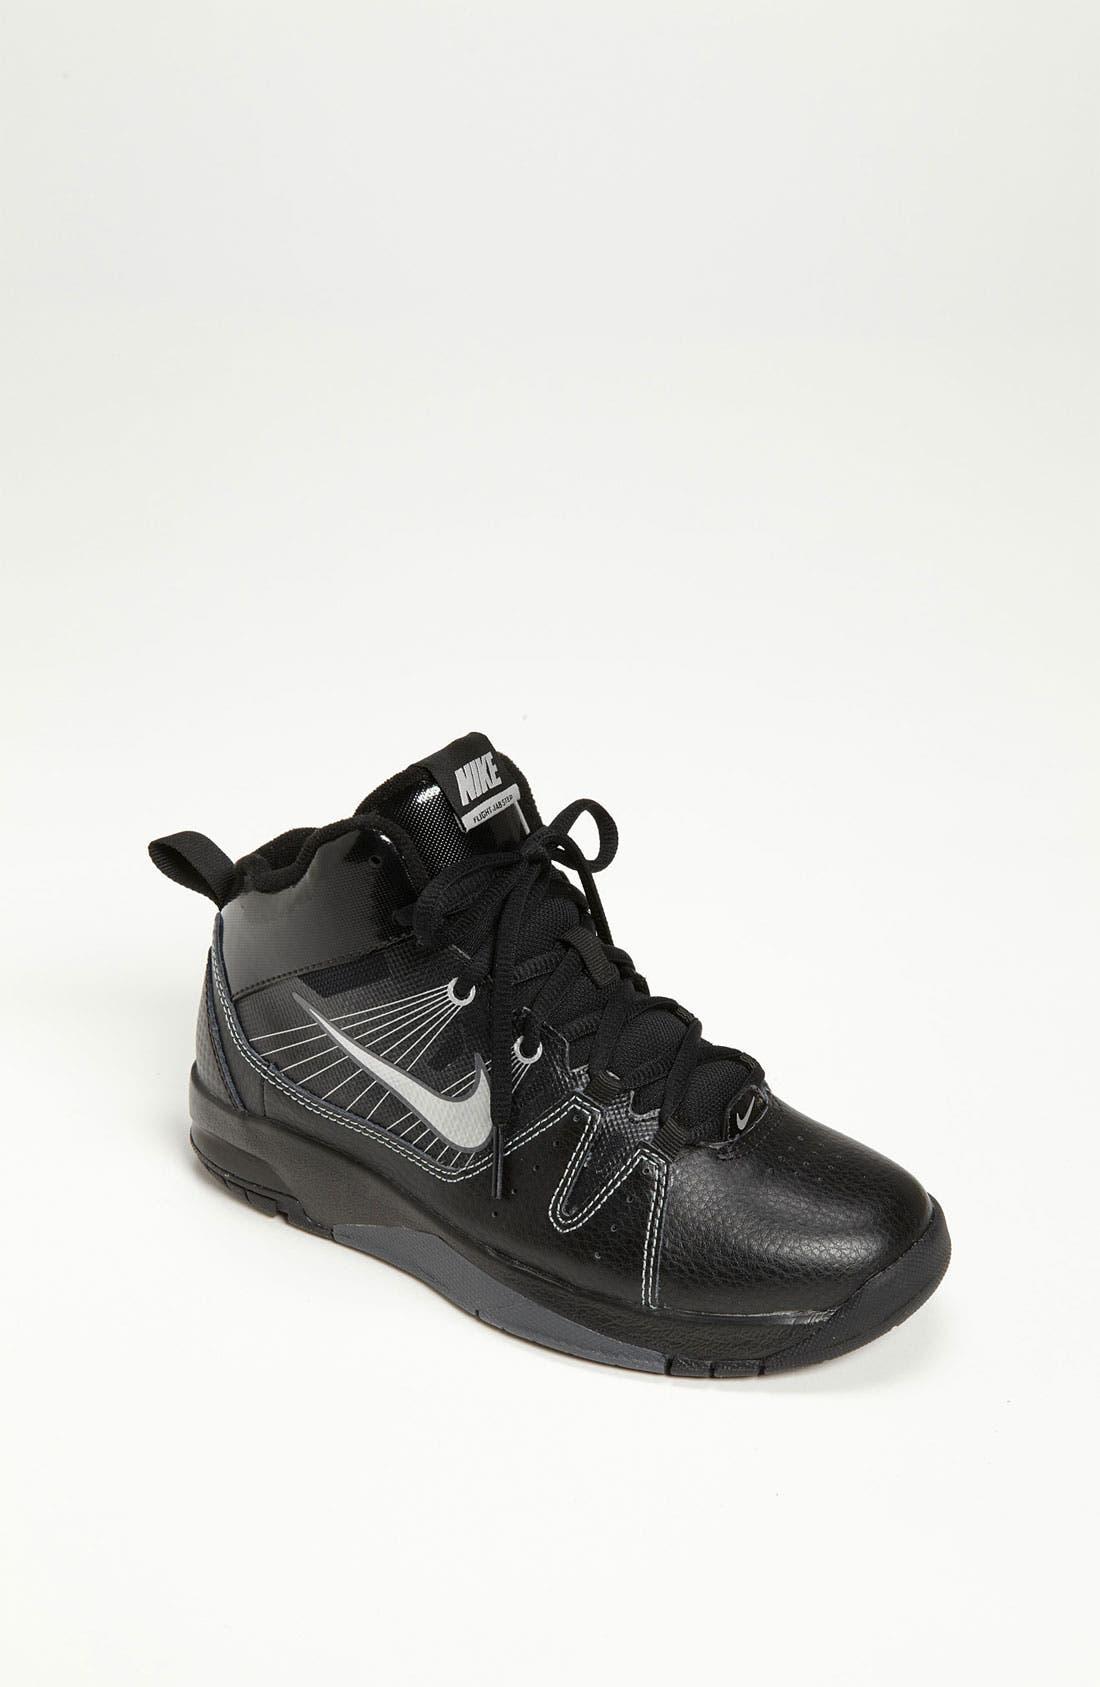 Alternate Image 1 Selected - Nike 'Flight Jab Step' Basketball Shoe (Toddler, Little Kid & Big Kid)